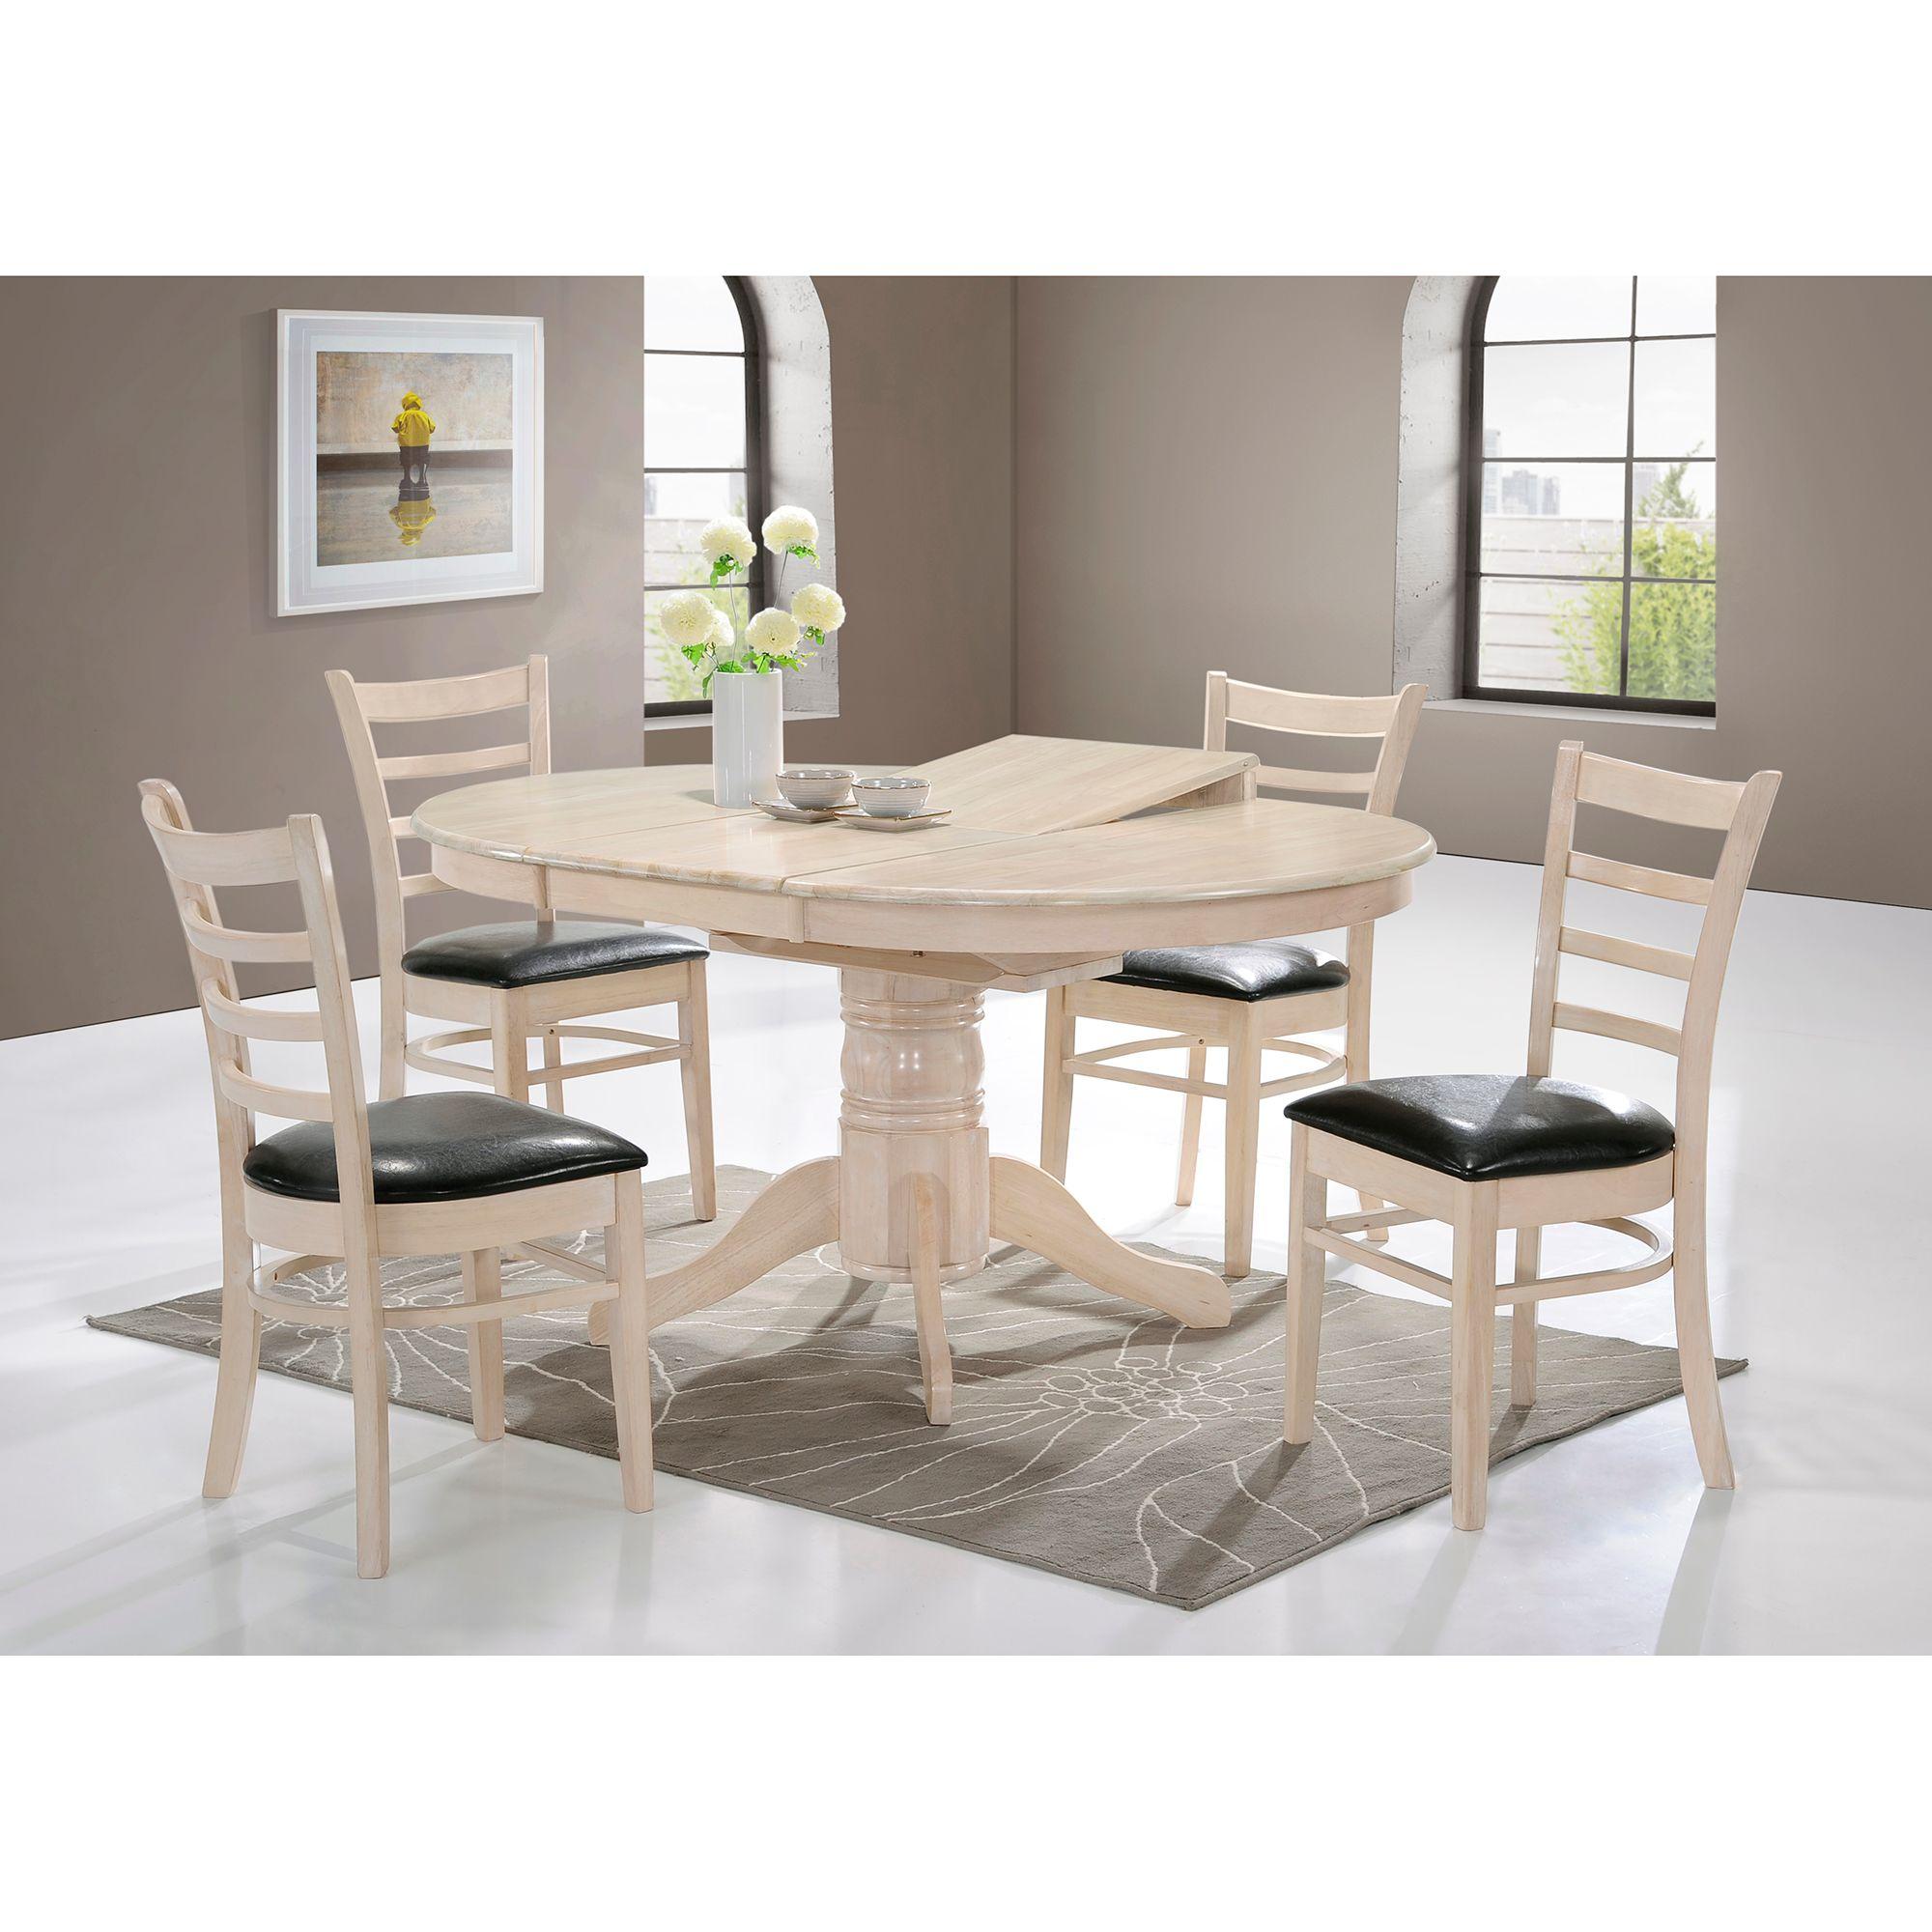 Fotografie Set 2 scaune dining / bucatarie Kring Virginia, tapitate, lemn masiv, 90x42x52 cm, Alb crem